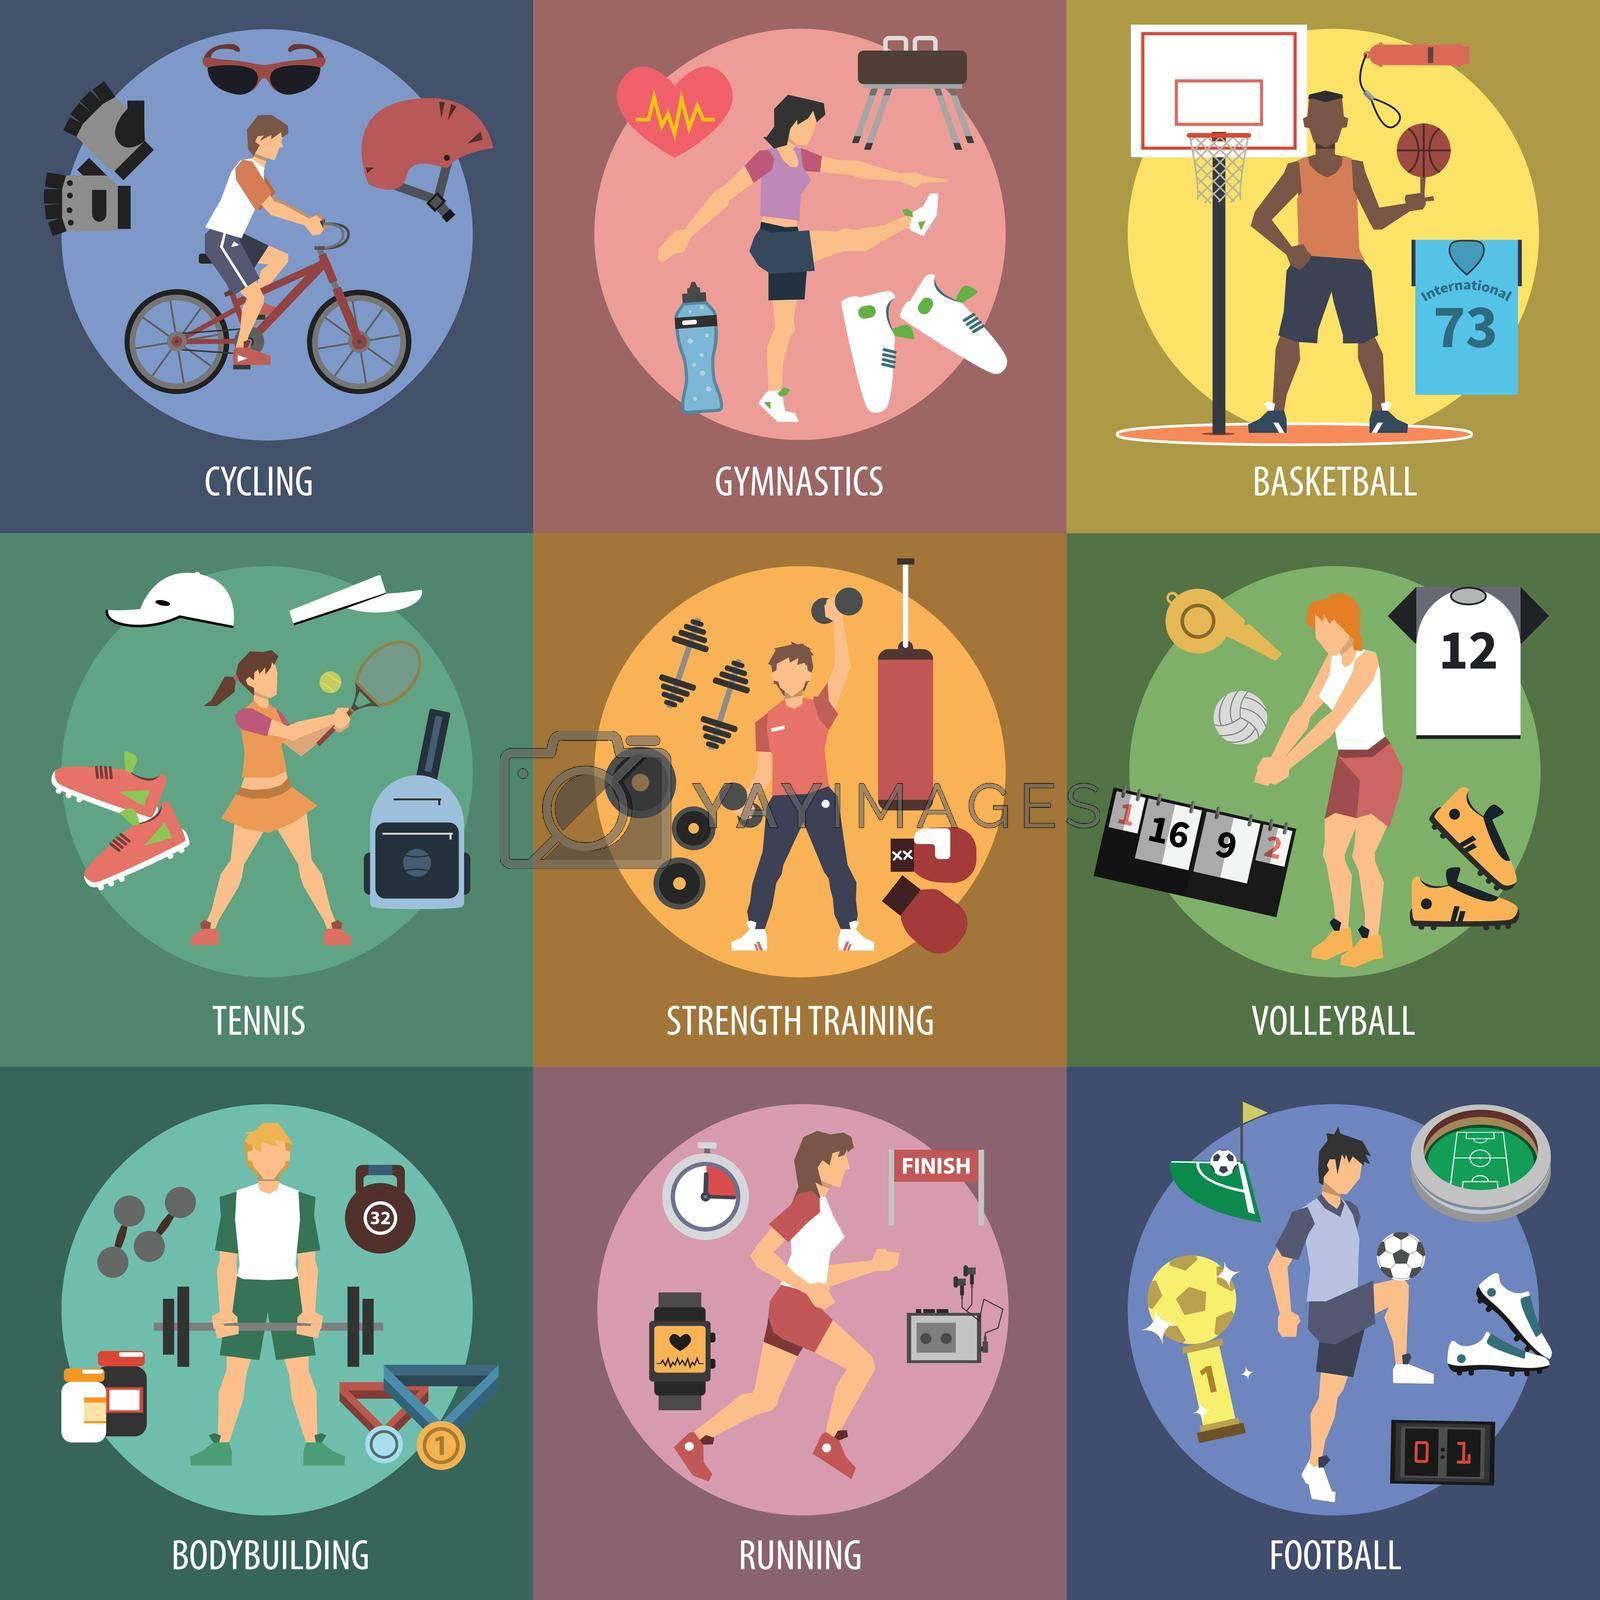 Royalty free image of Sport People Concepts by mstjahanara